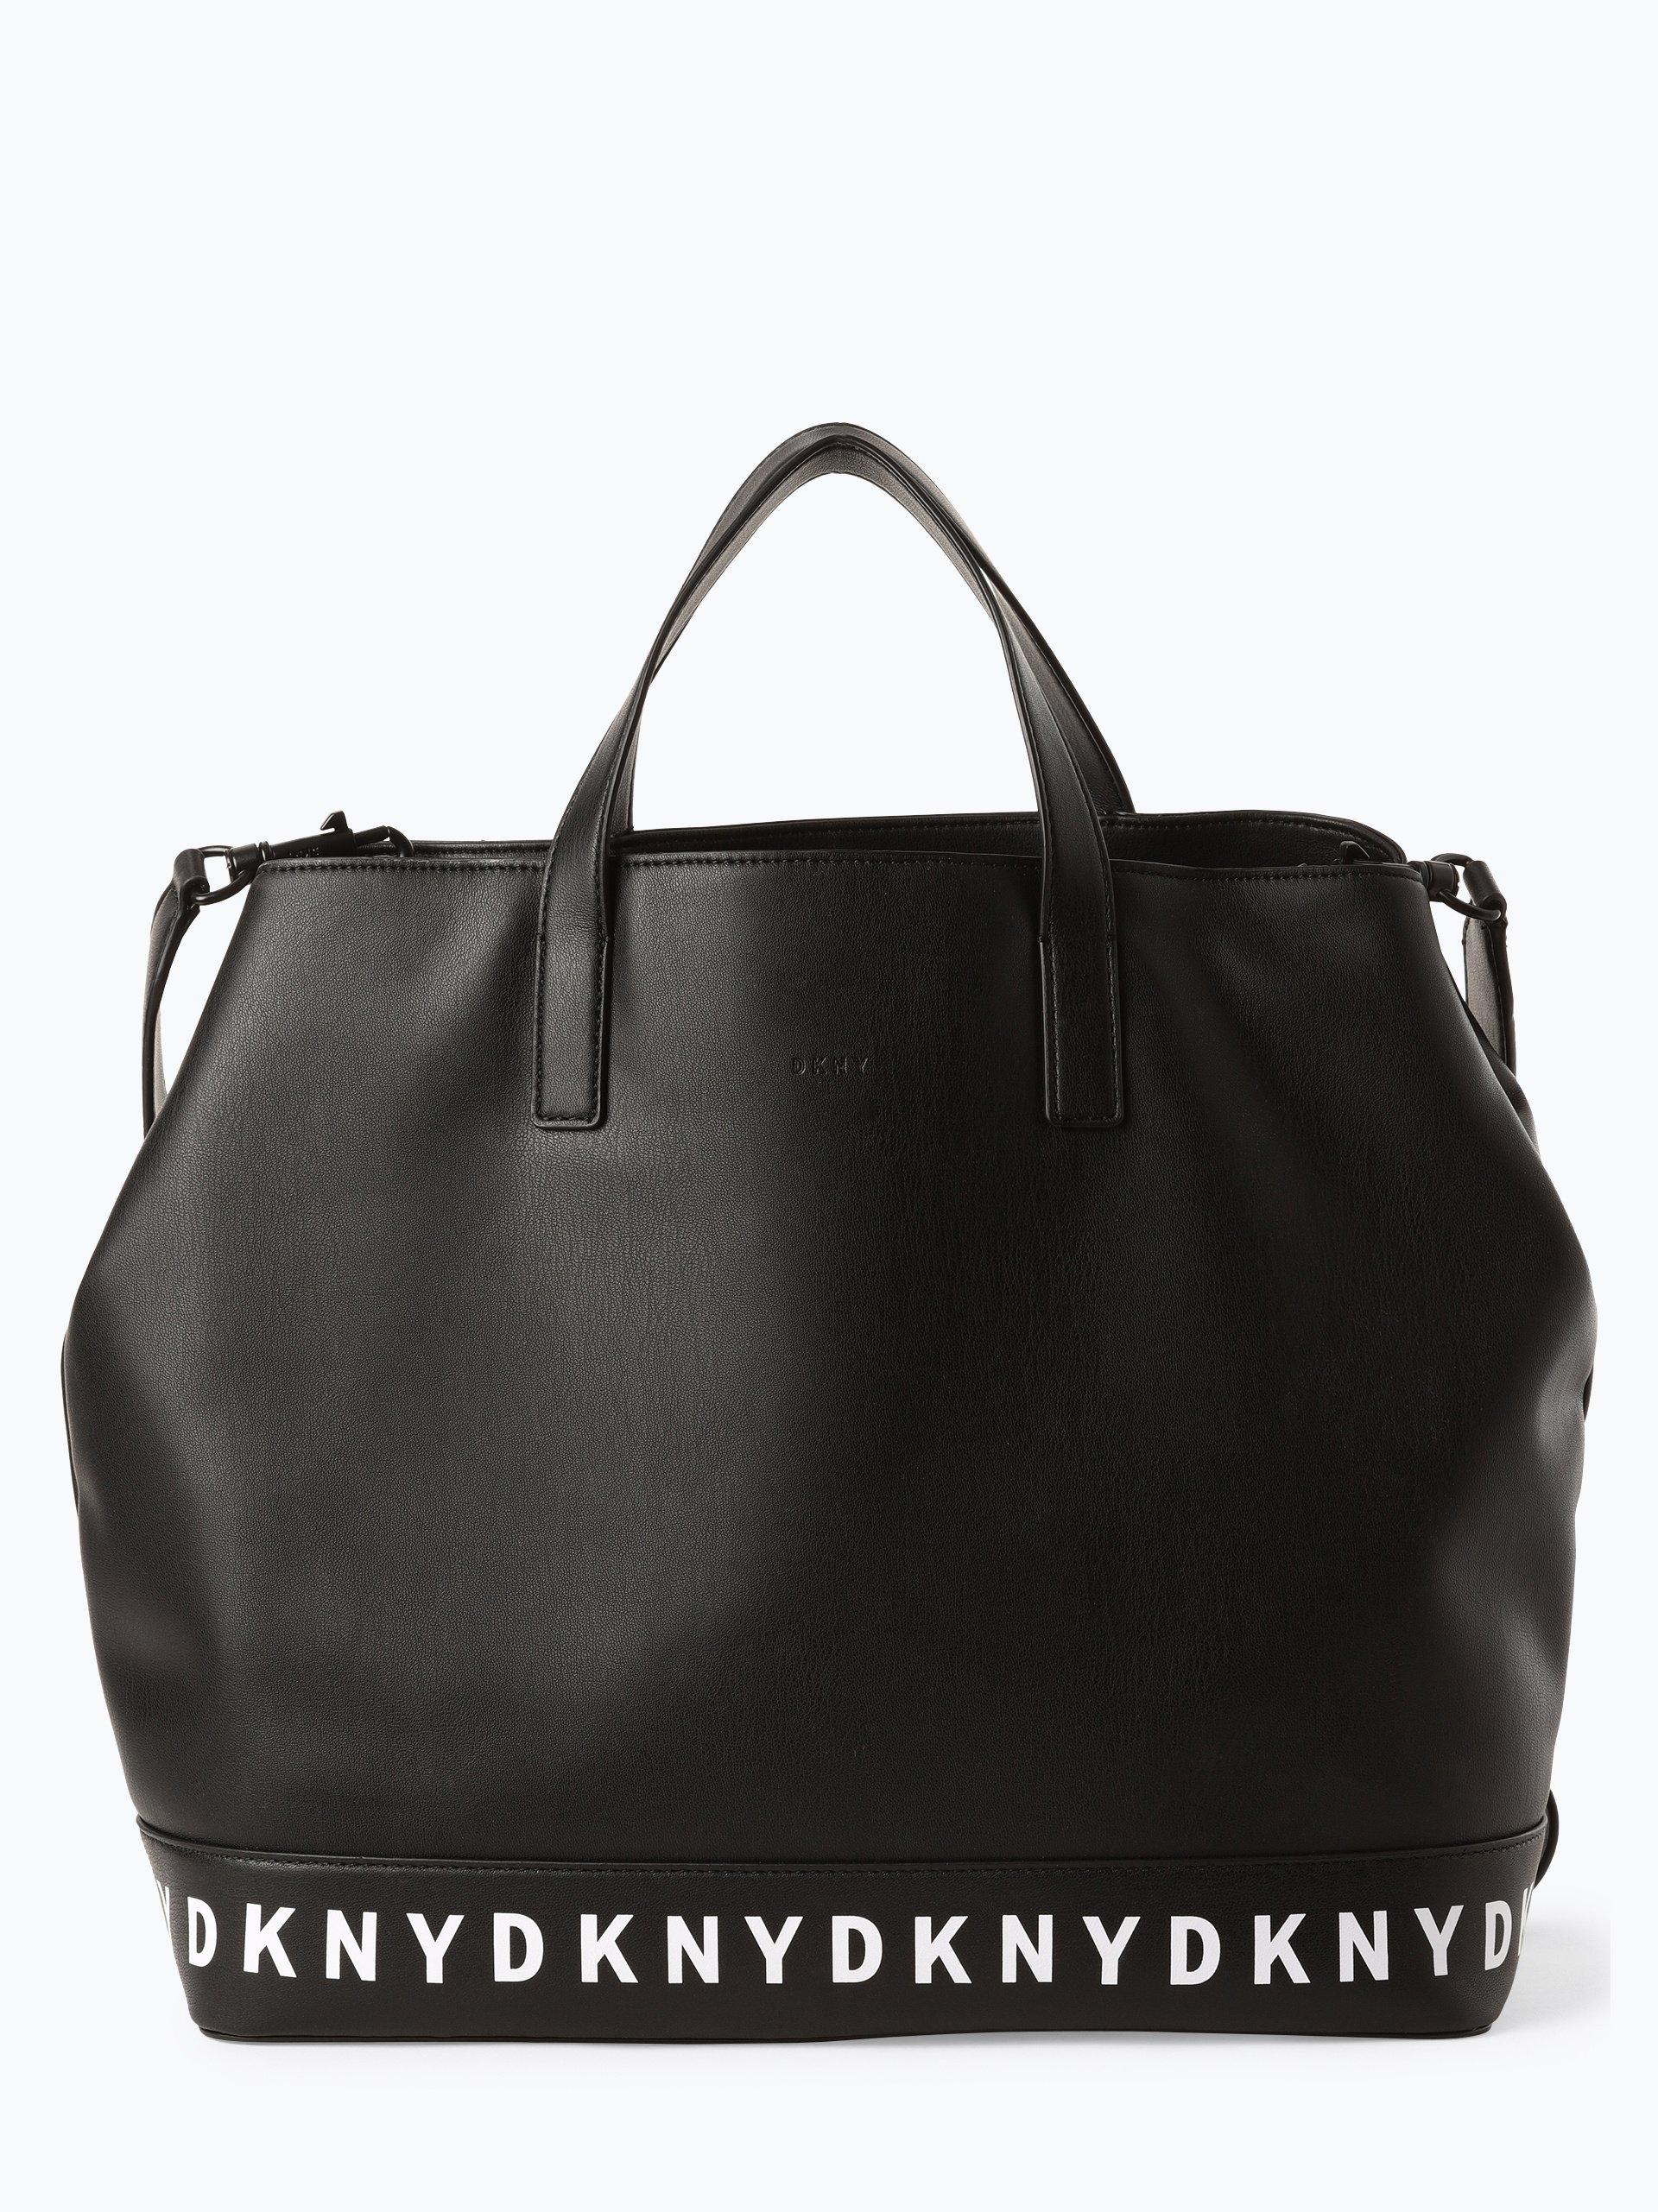 DKNY Damska torba shopper